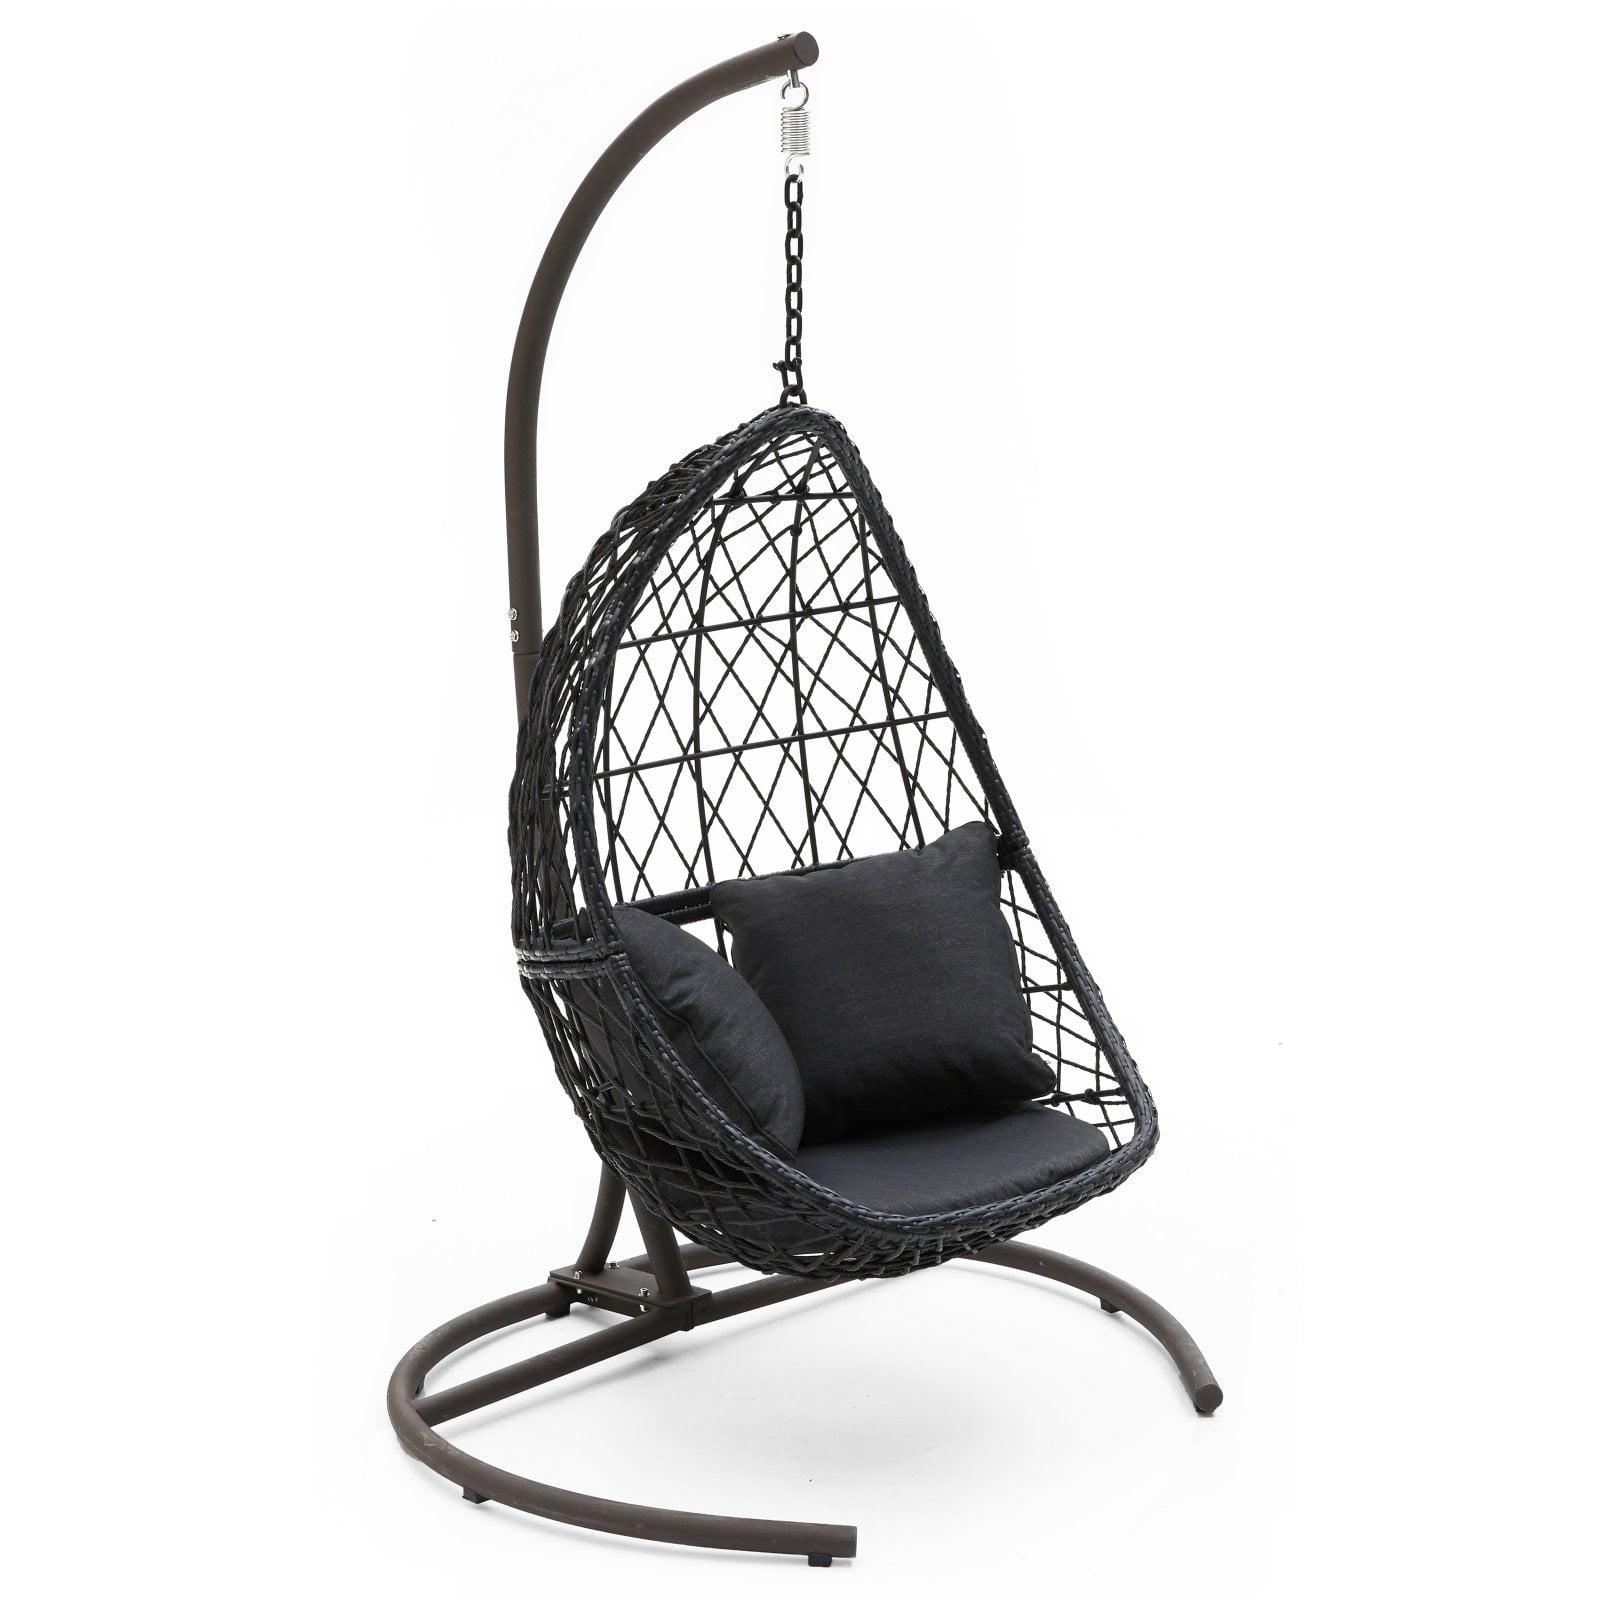 The Egg Chair.Belham Living Capeside Outdoor Wicker Hanging Egg Chair